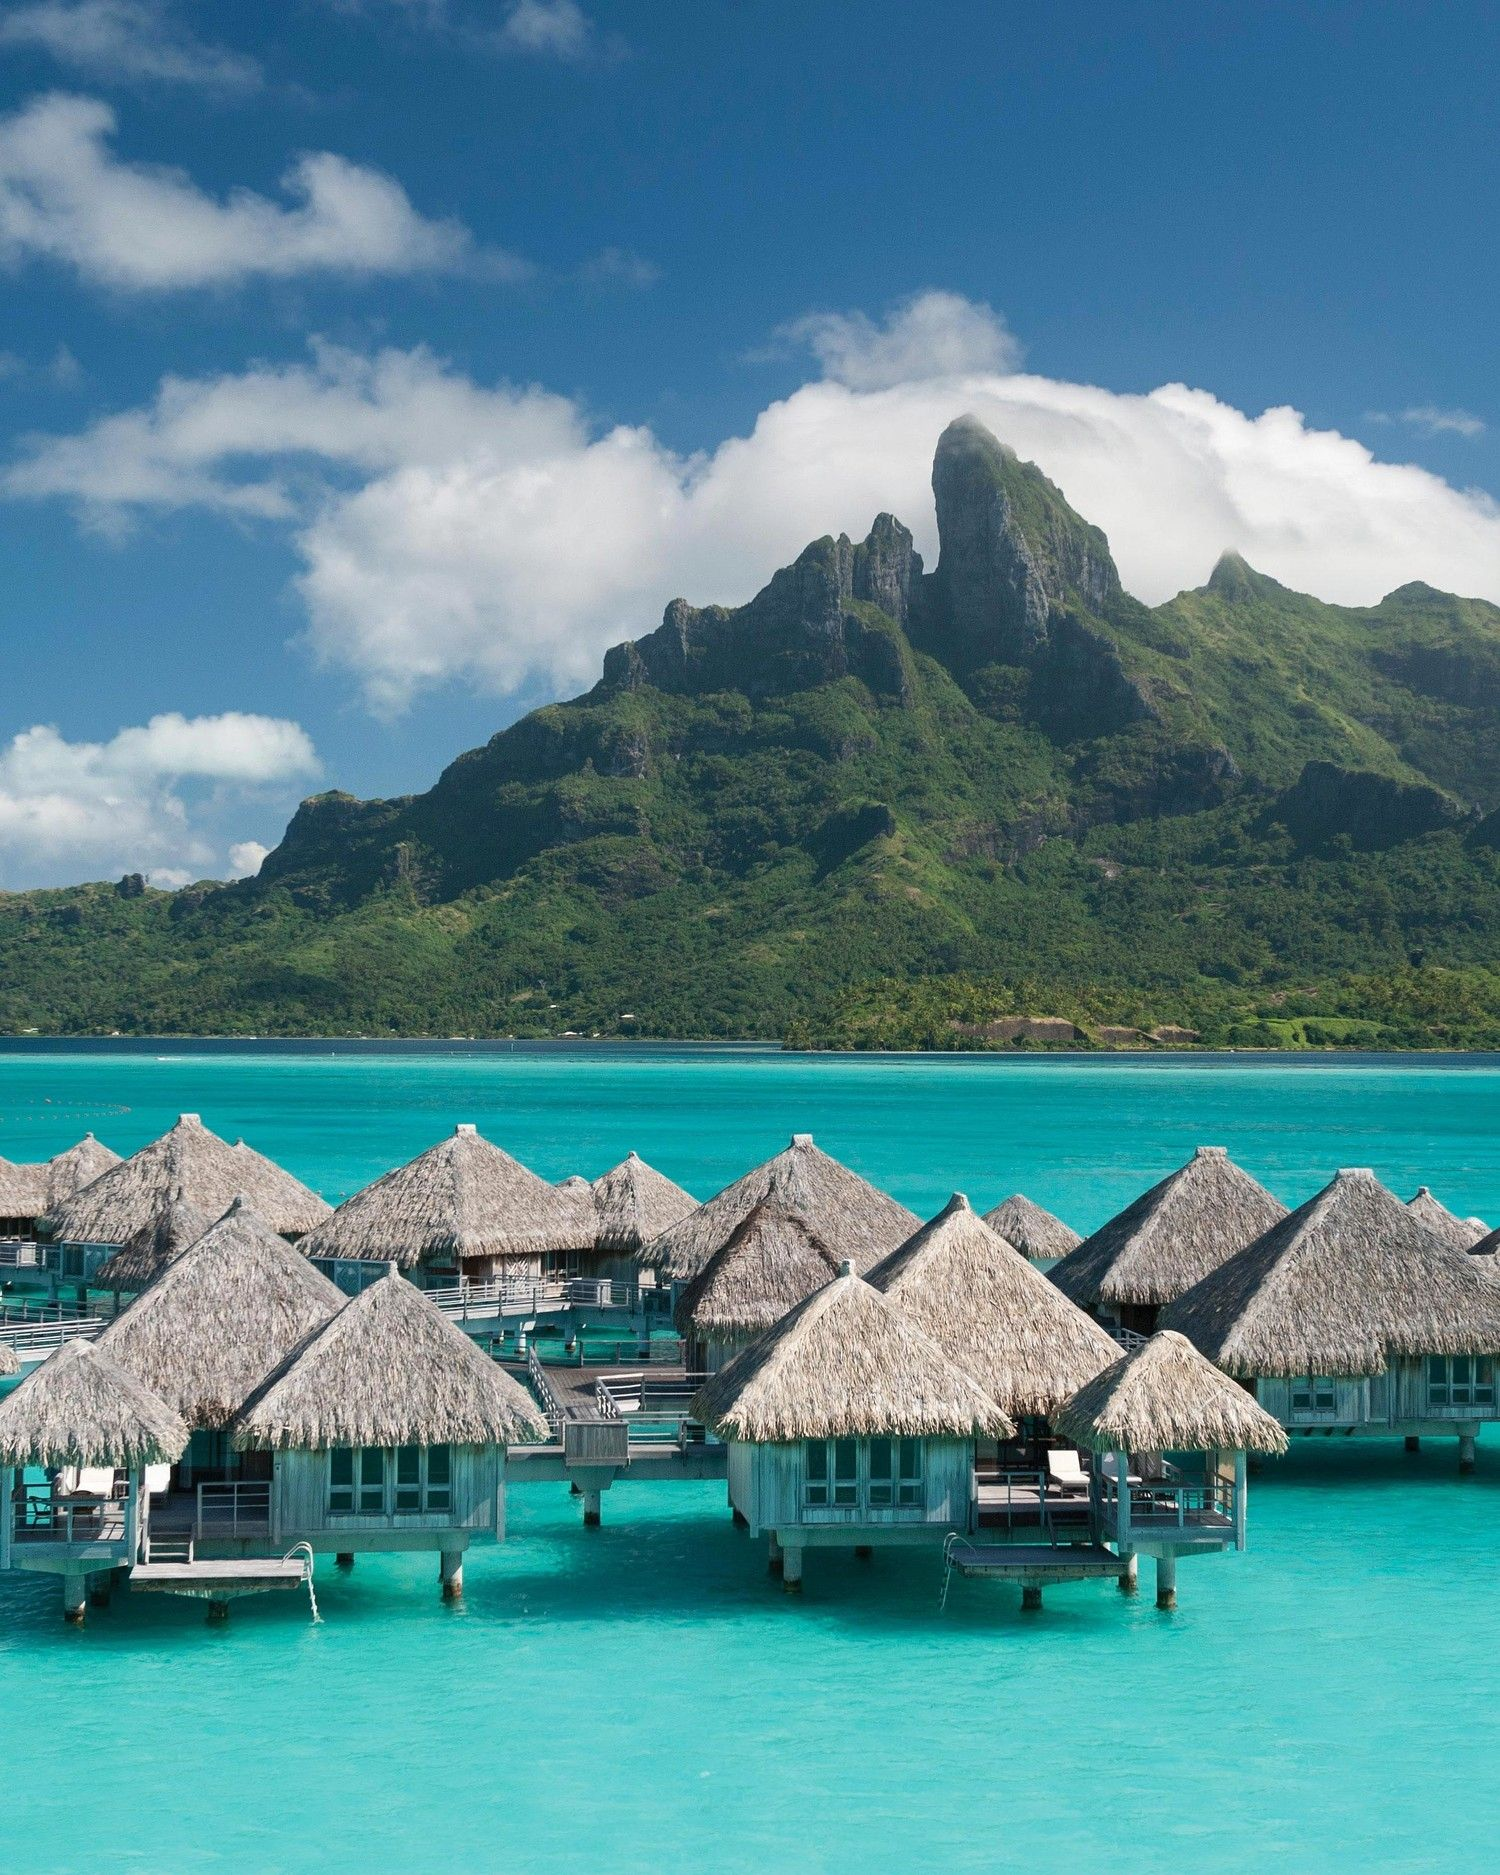 22 Honeymoon Photos That Will Give You Serious Wanderlust Vacanze Da Sogno Luoghi Di Vacanza Bora Bora